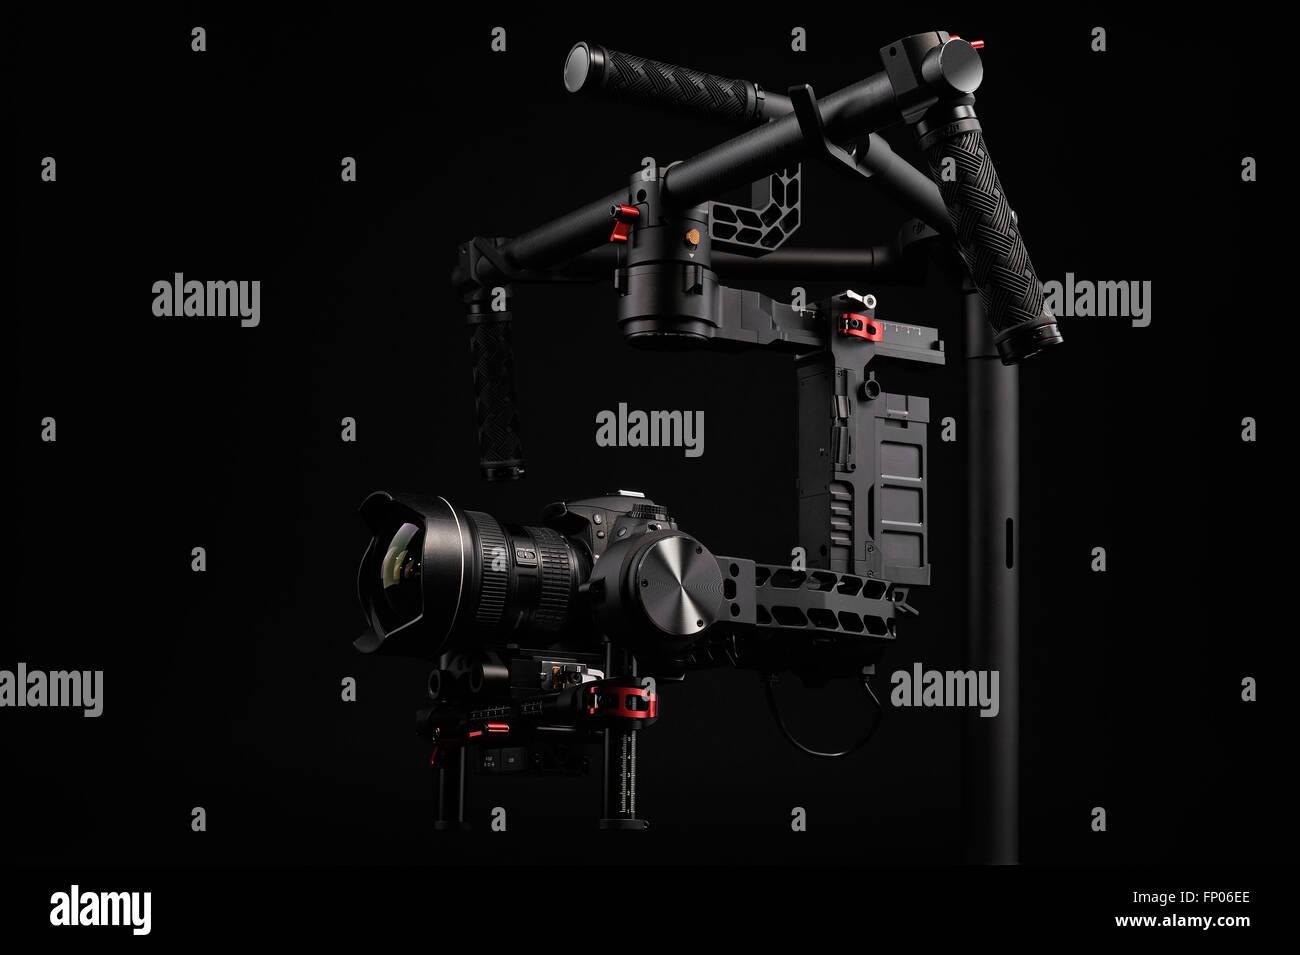 Professional camera set on a 3-axis gimbal - Stock Image